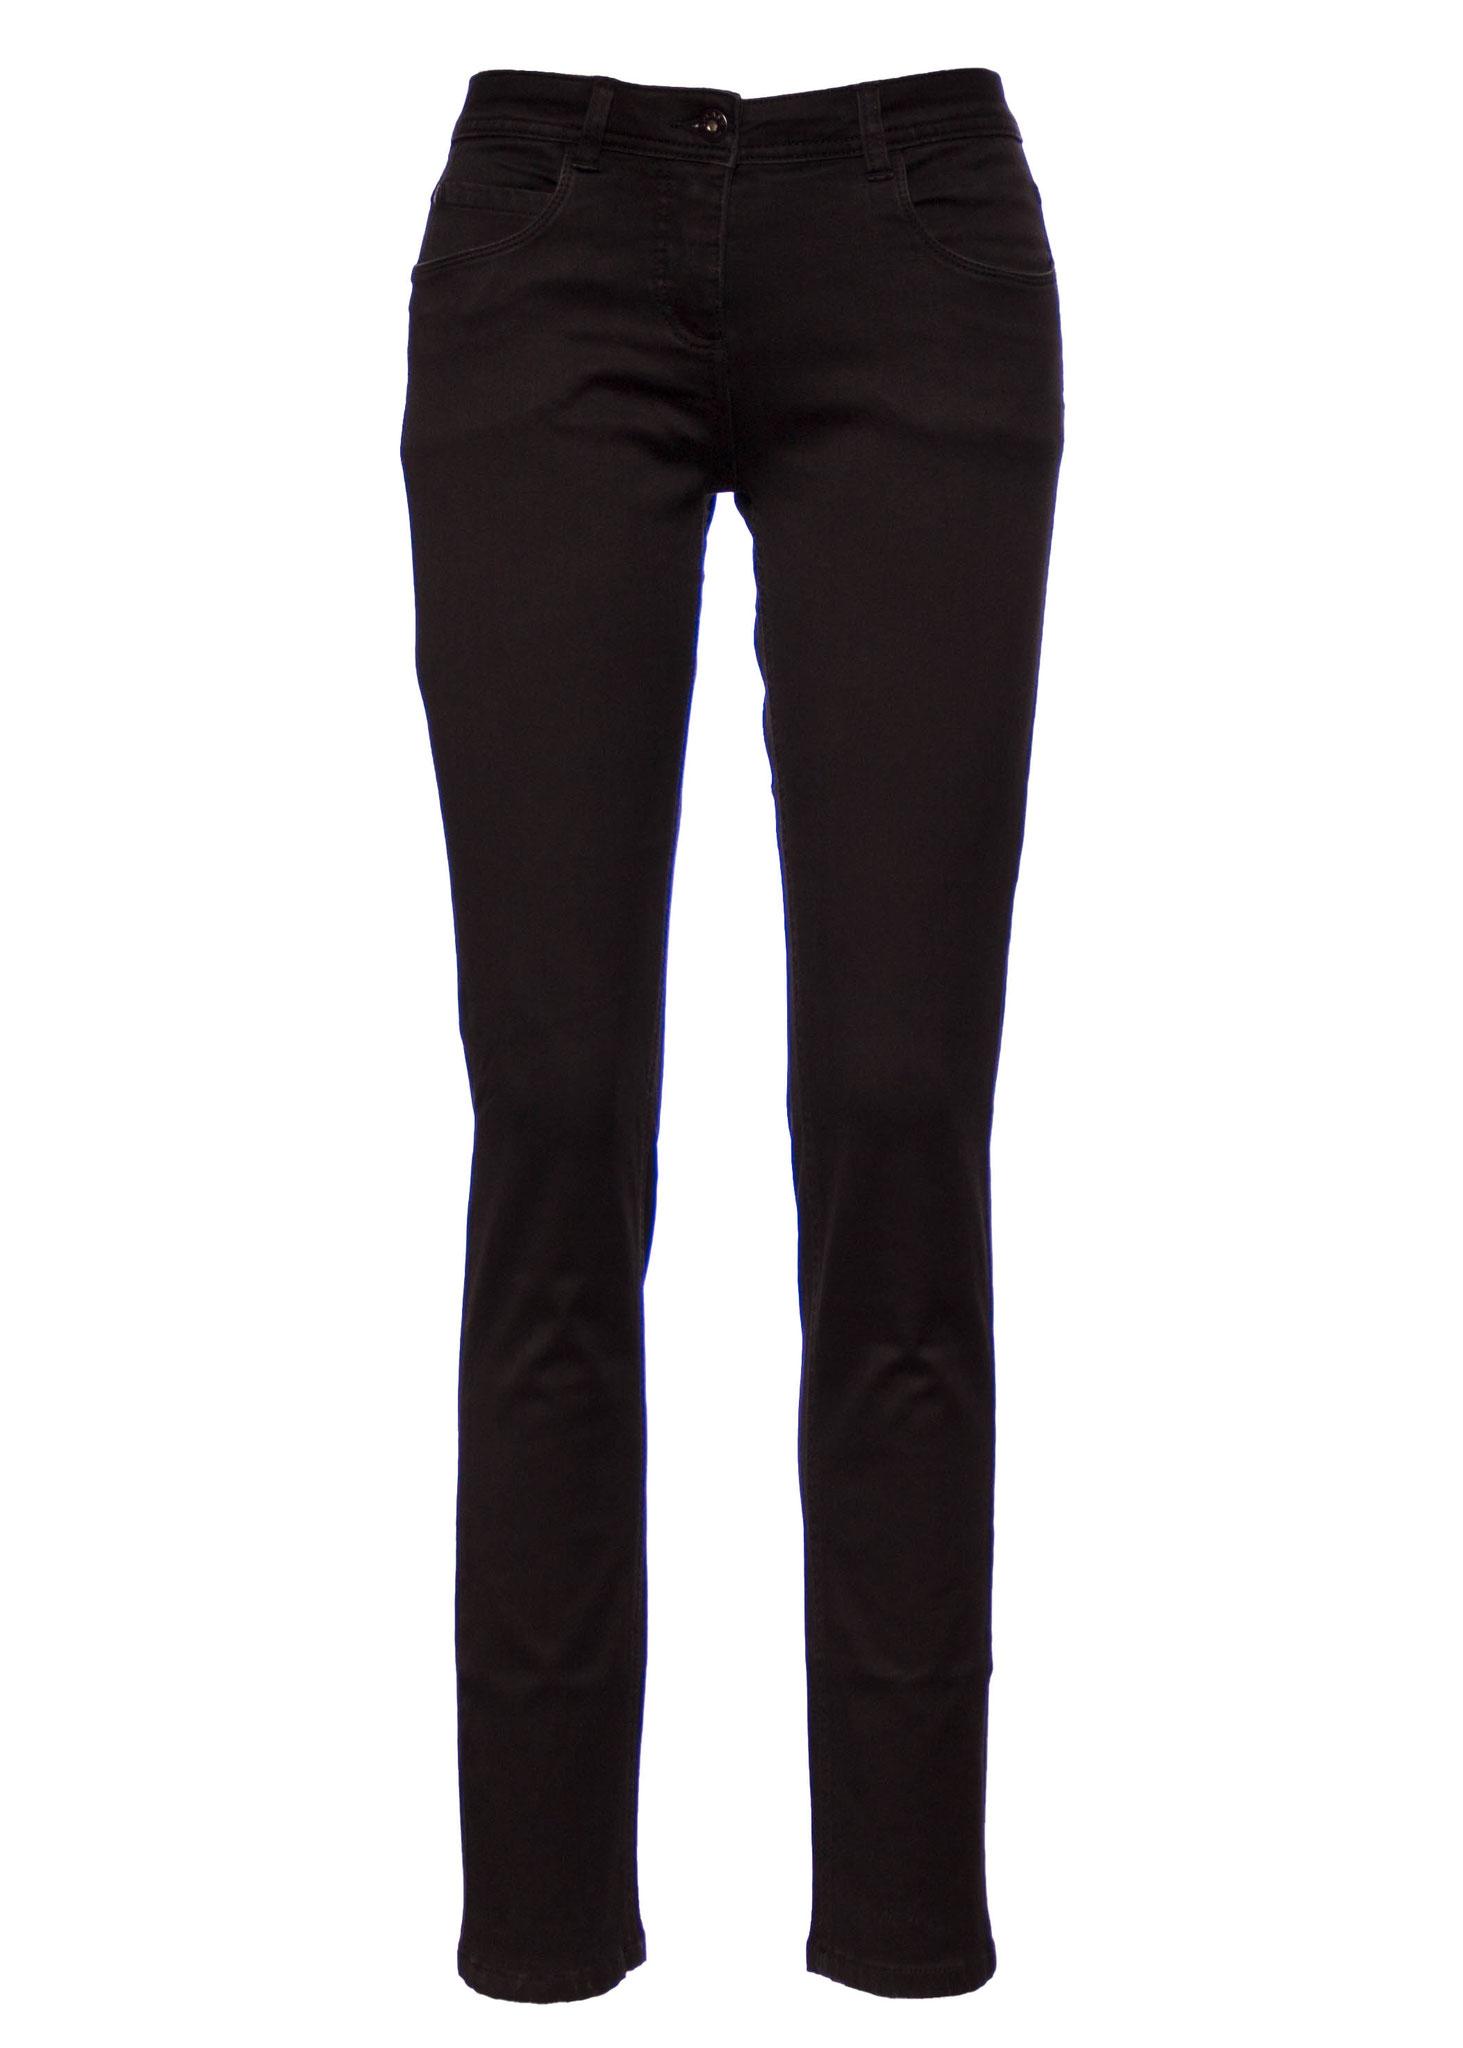 Jeans Black 39,99€